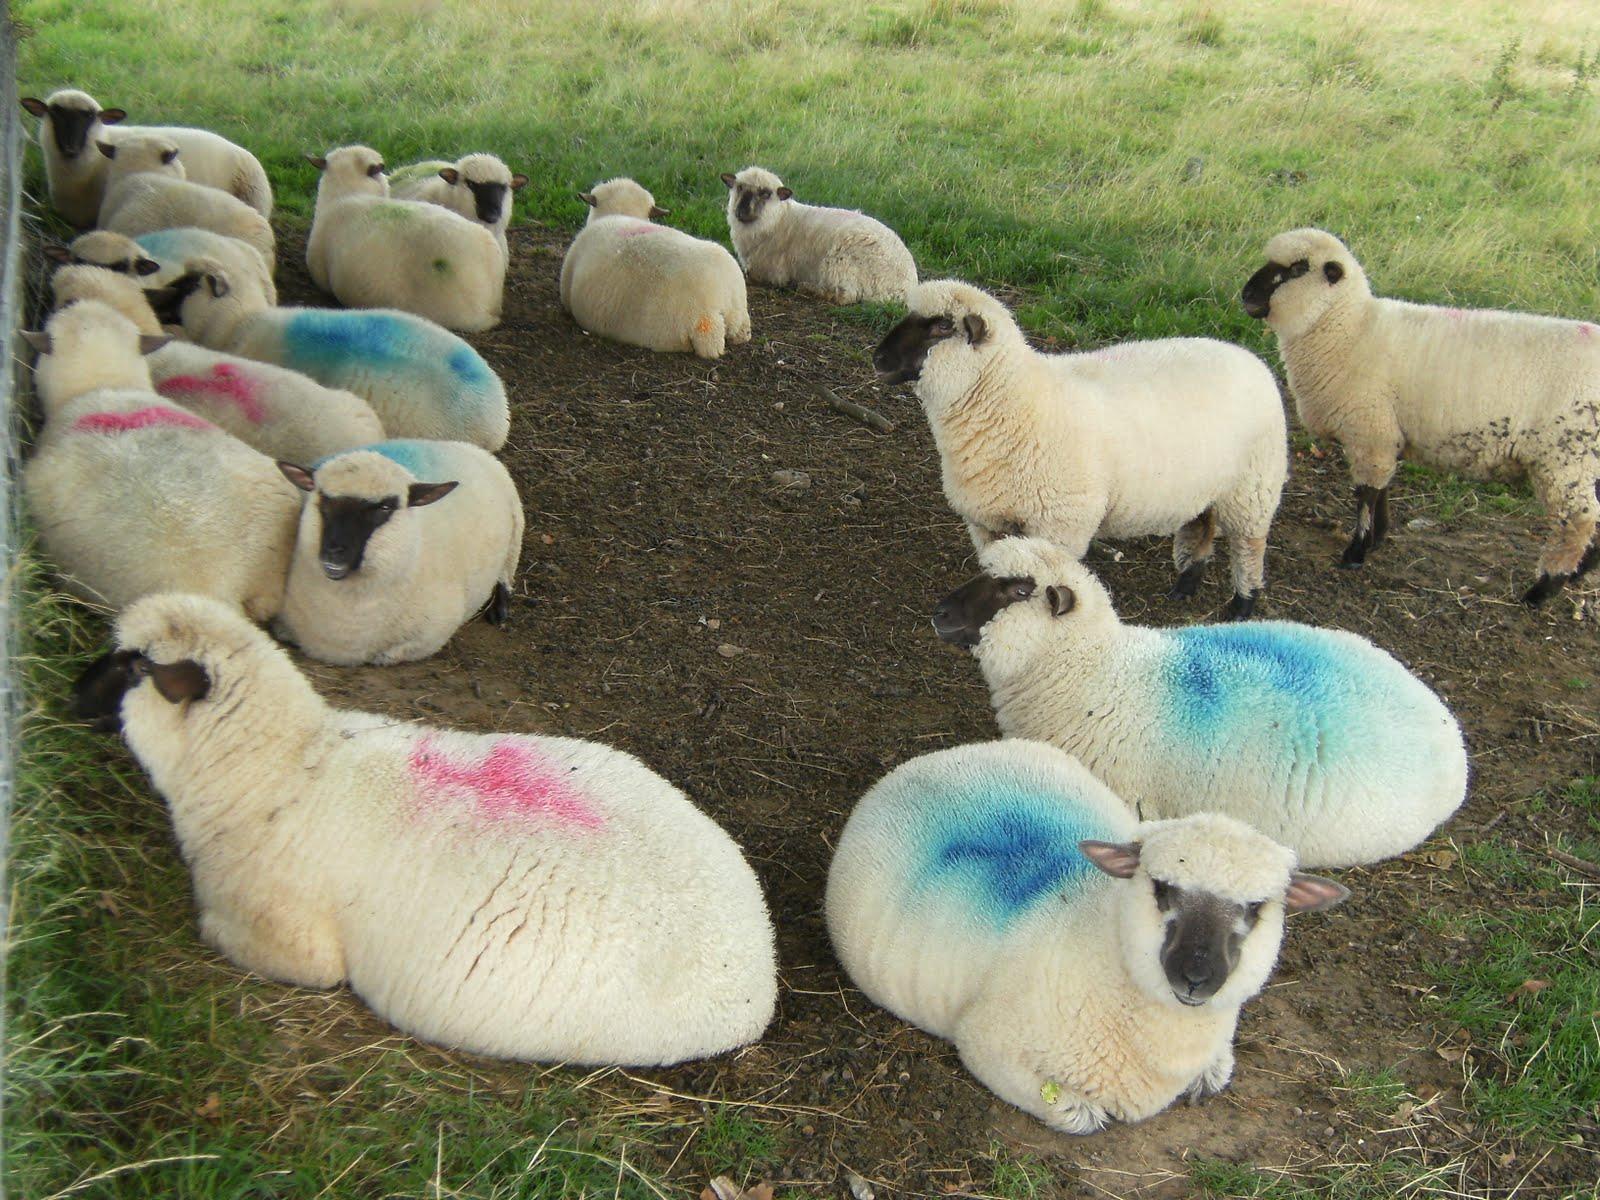 DSCF9269 Resting sheep